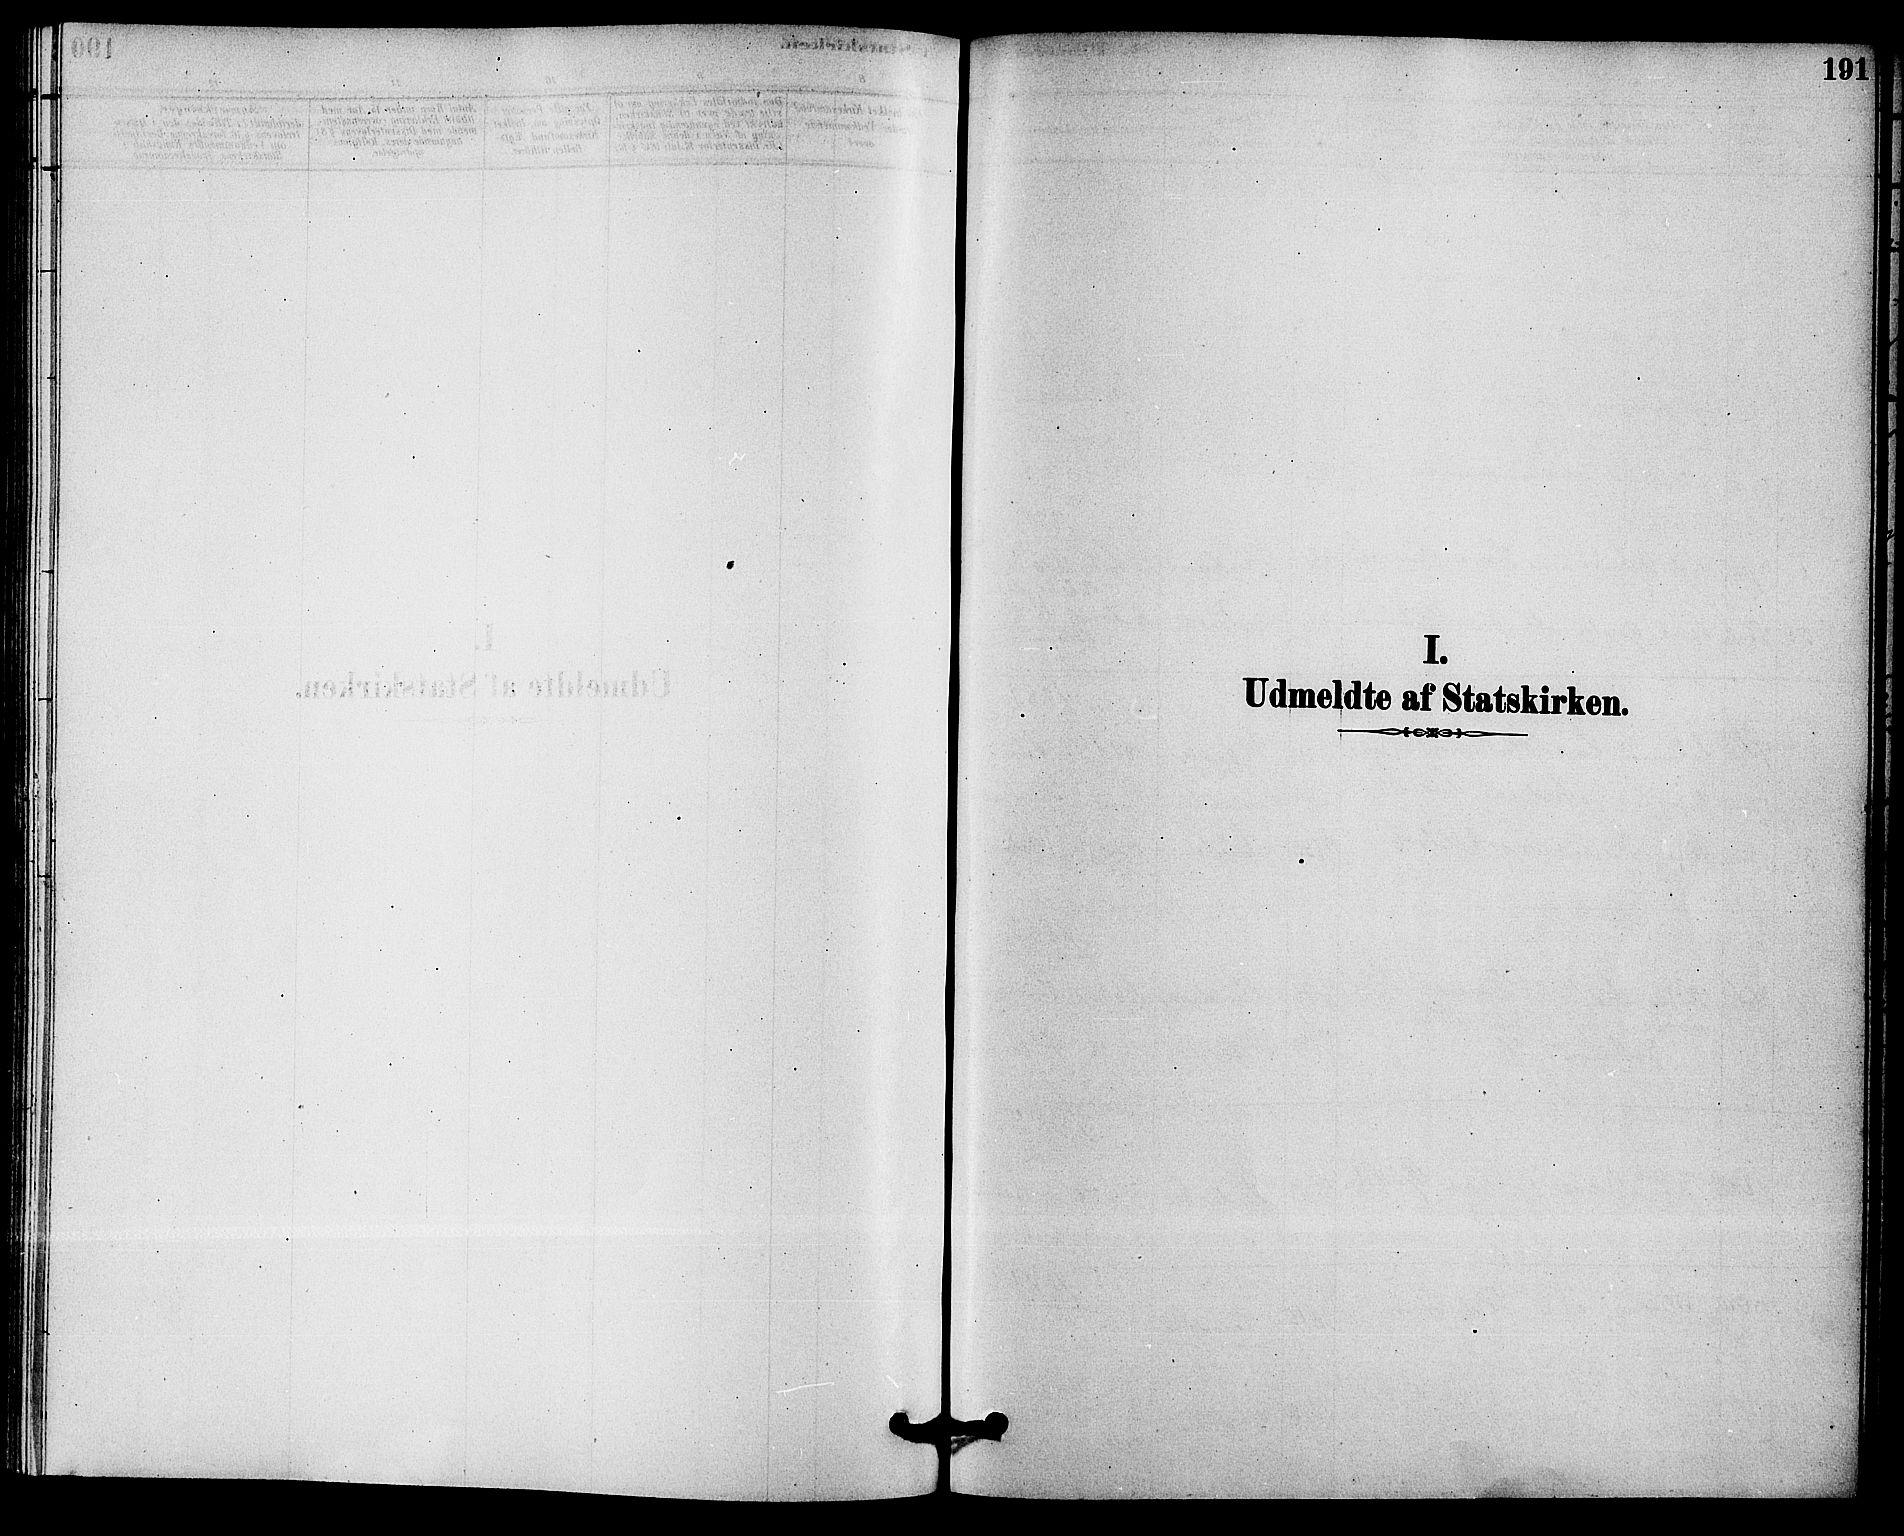 SAKO, Solum kirkebøker, F/Fb/L0001: Ministerialbok nr. II 1, 1877-1892, s. 191